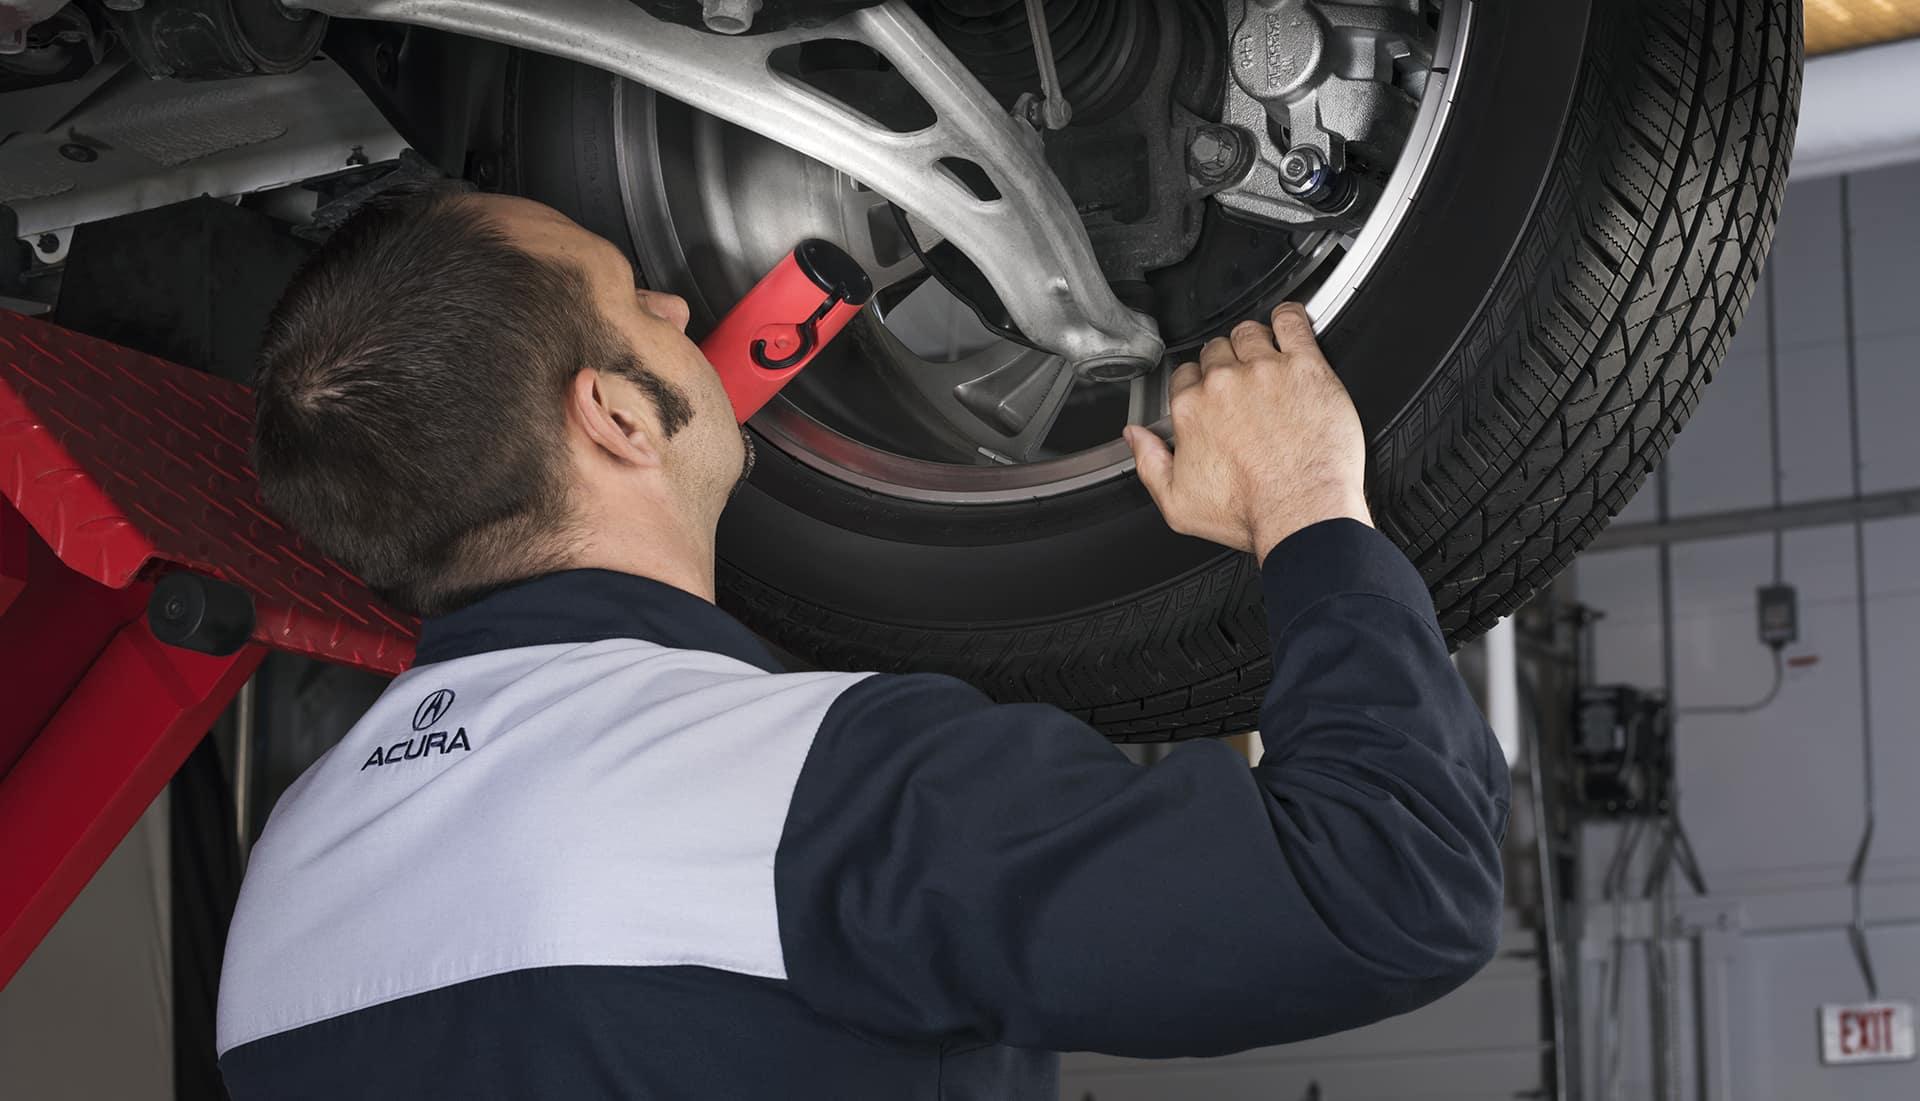 Acura Technician